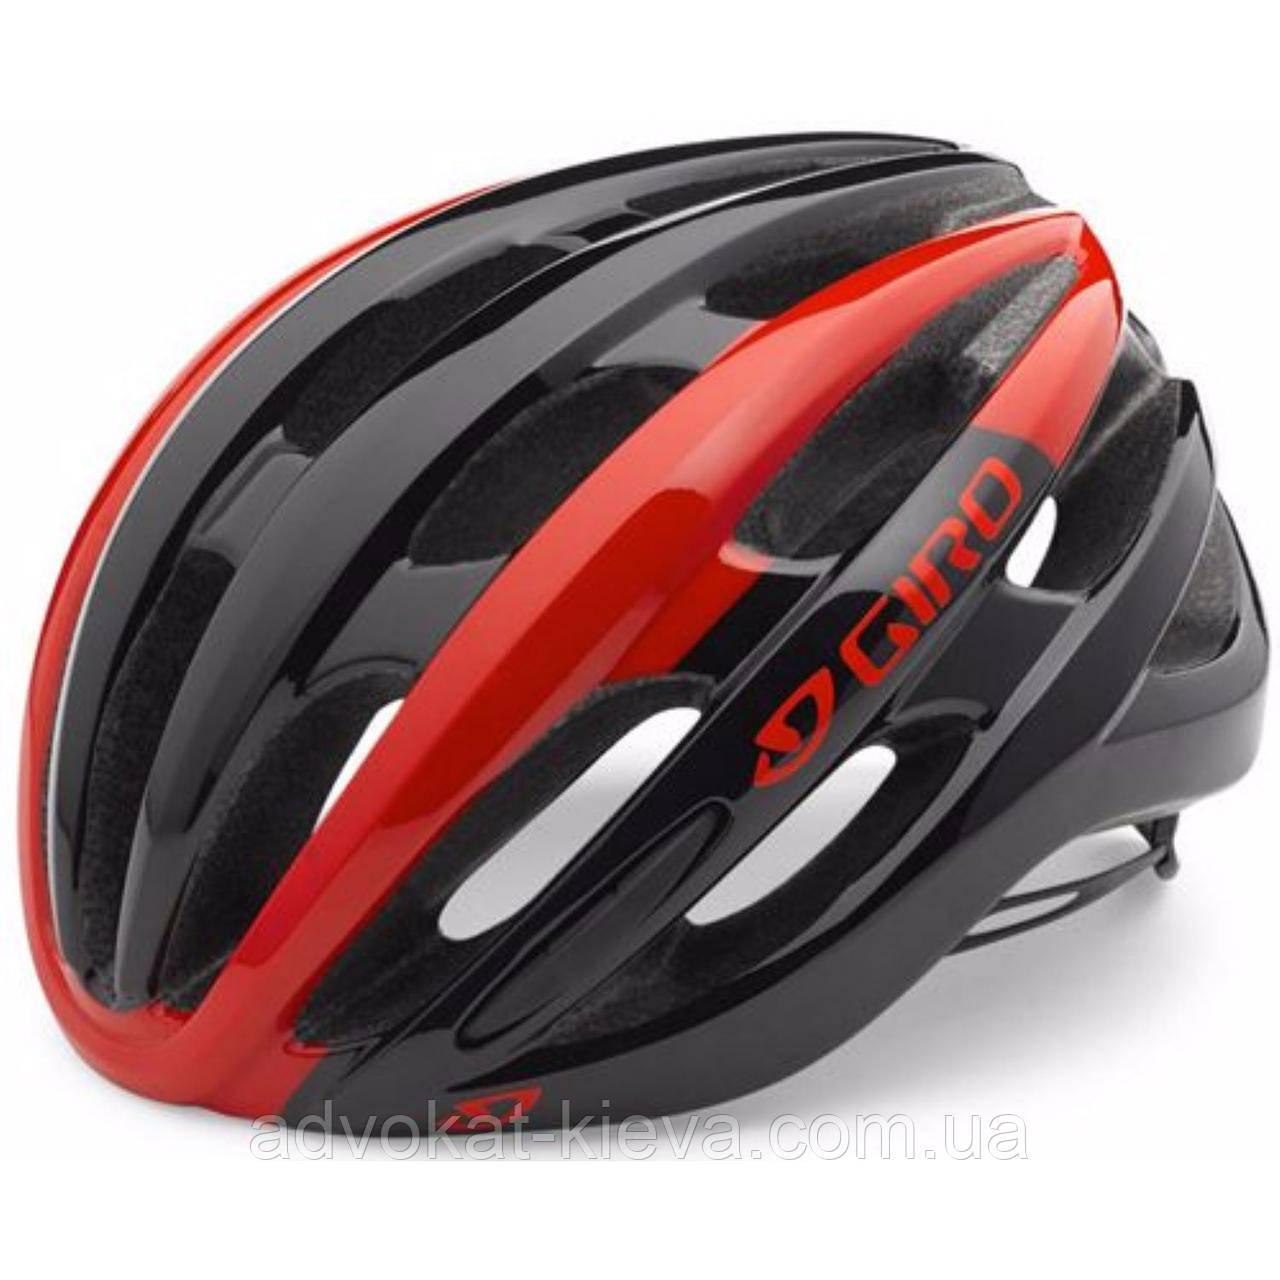 Свой Велошлем Giro Foray 2019 унисекс размер 55-59 Оригинал